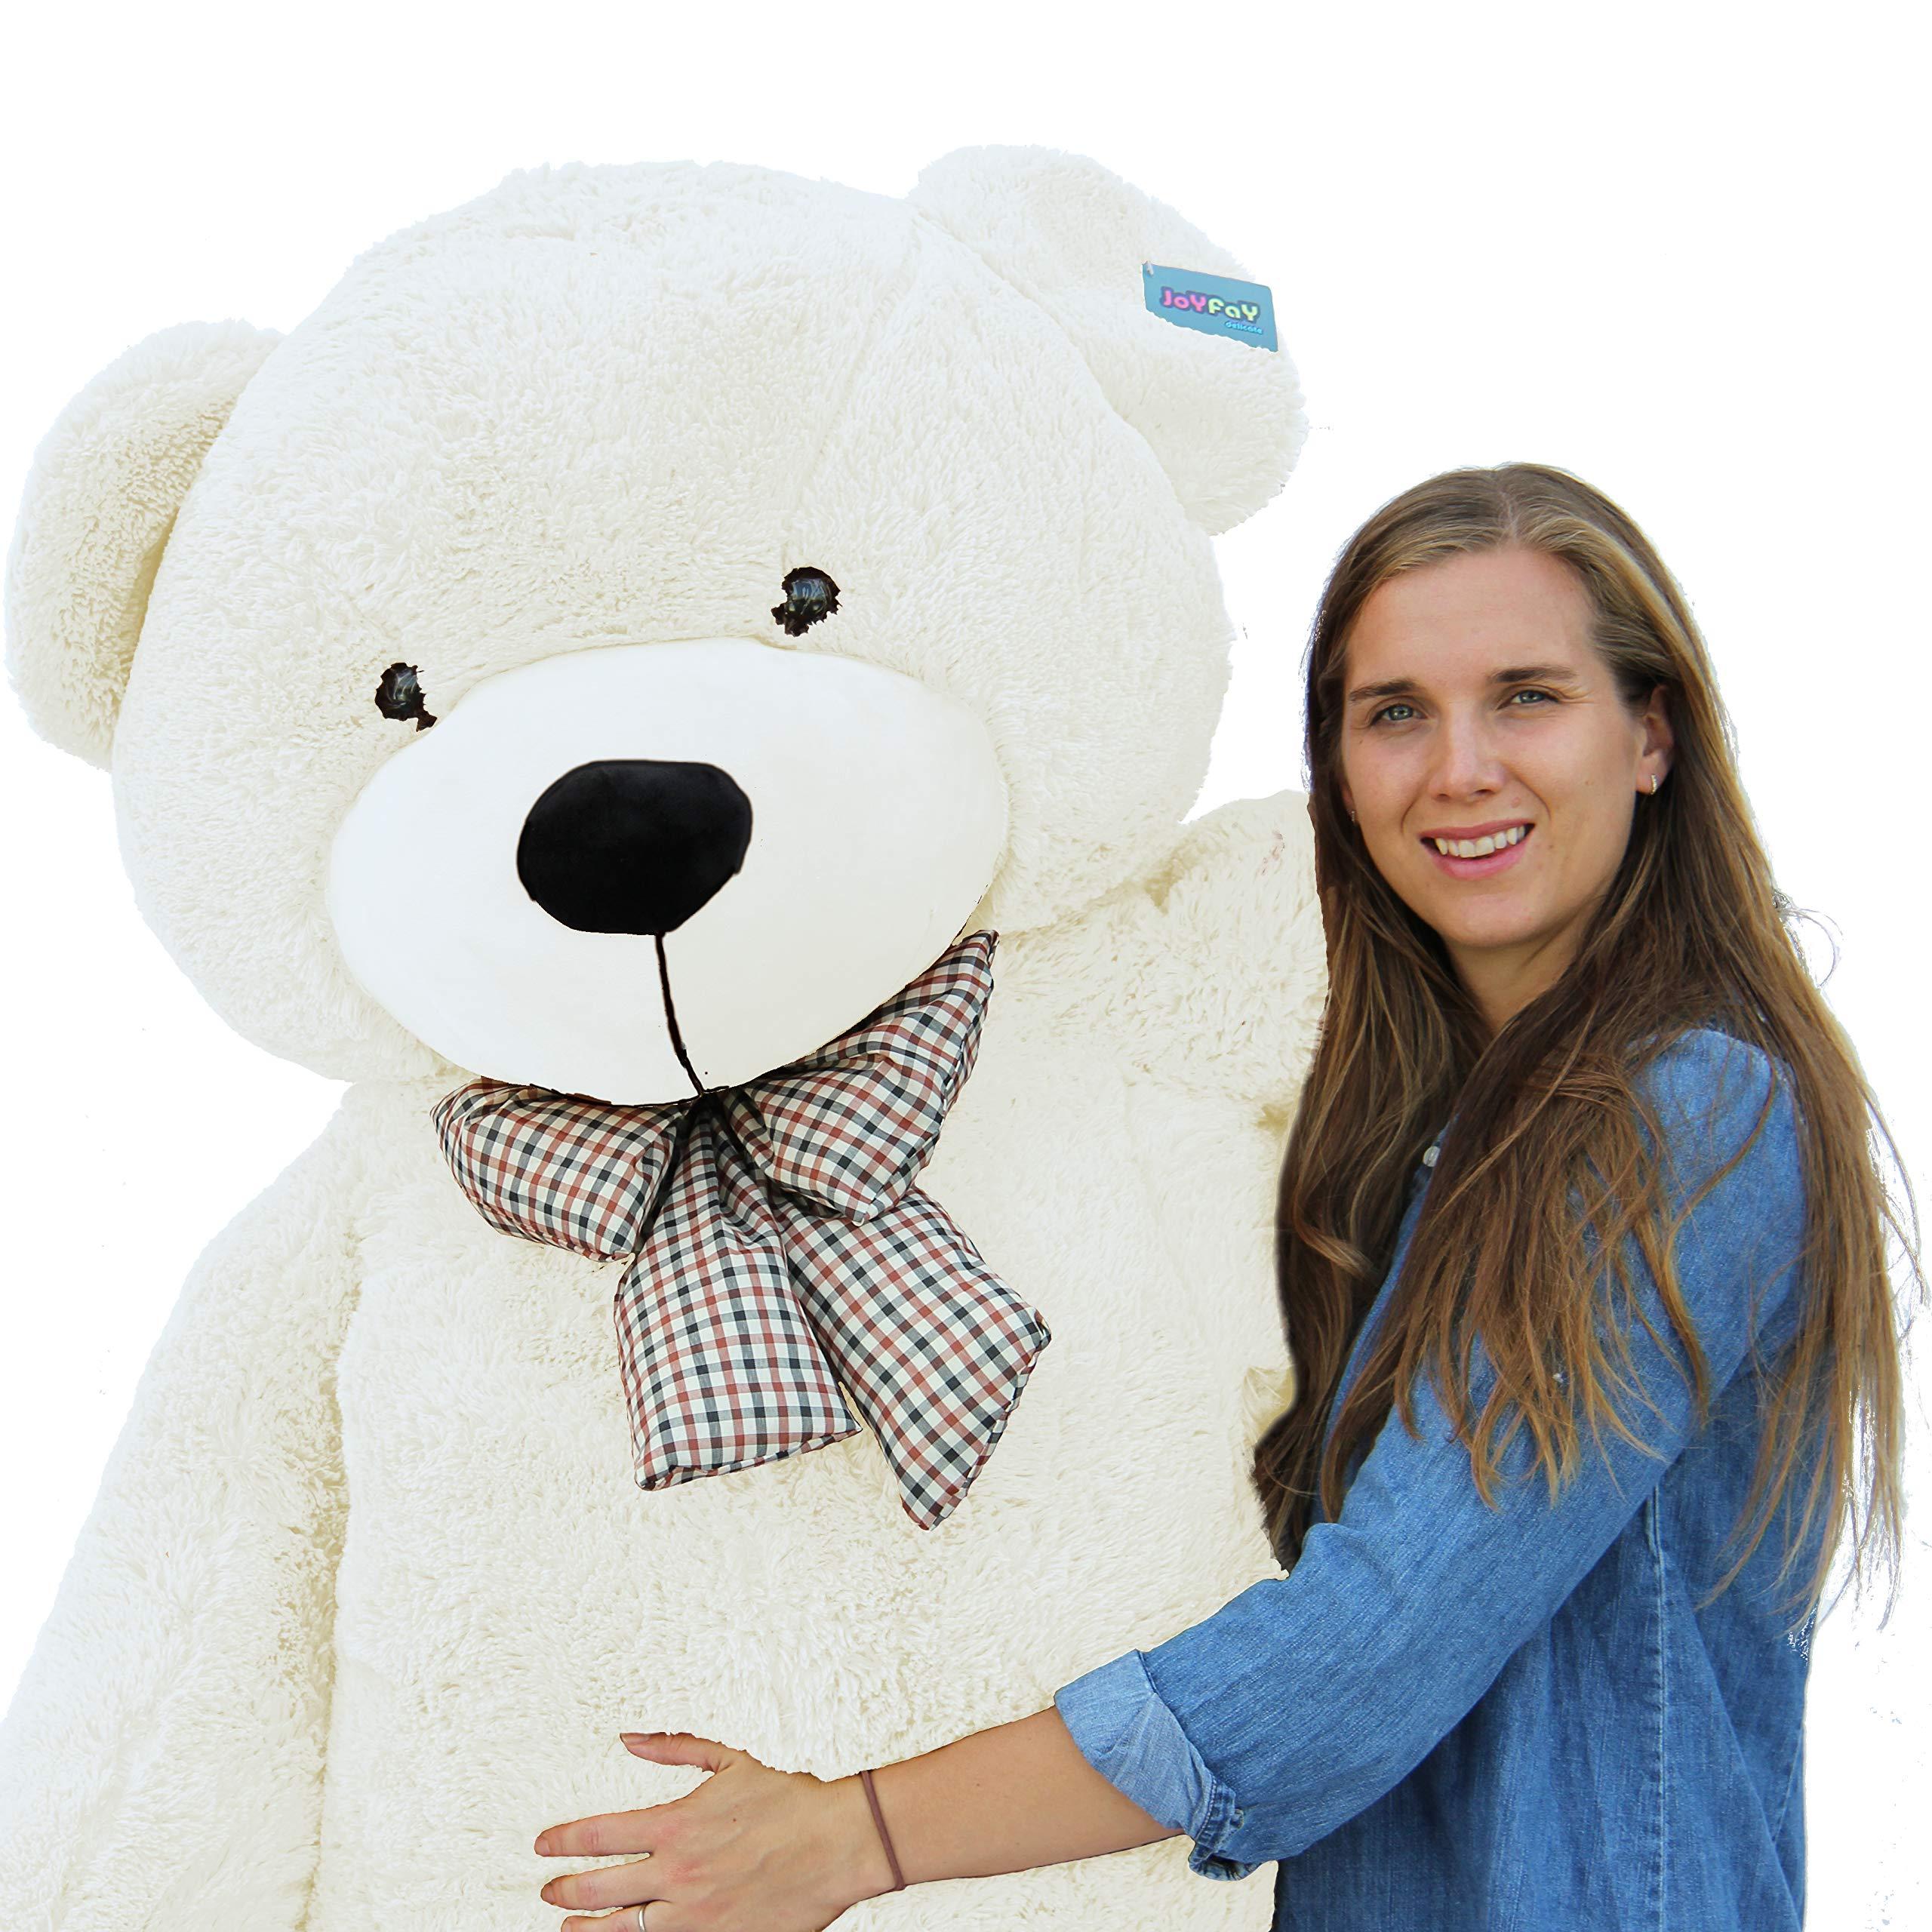 Joyfay Giant Teddy Bear 78''(6.5 Feet) White by Joyfay